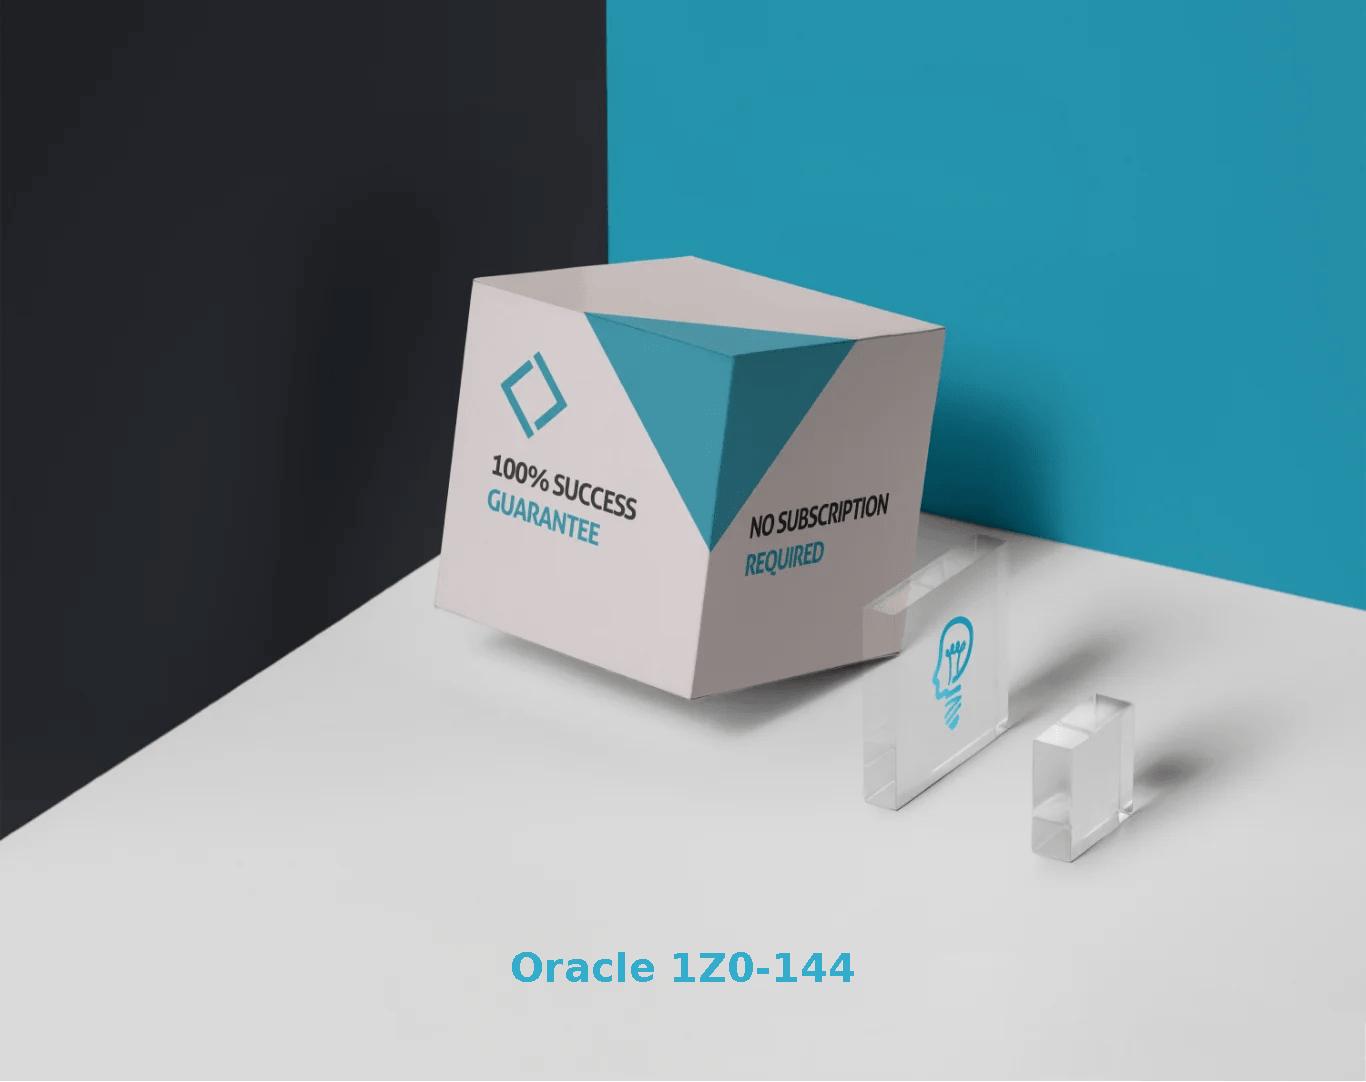 Oracle 1Z0-144 Exams